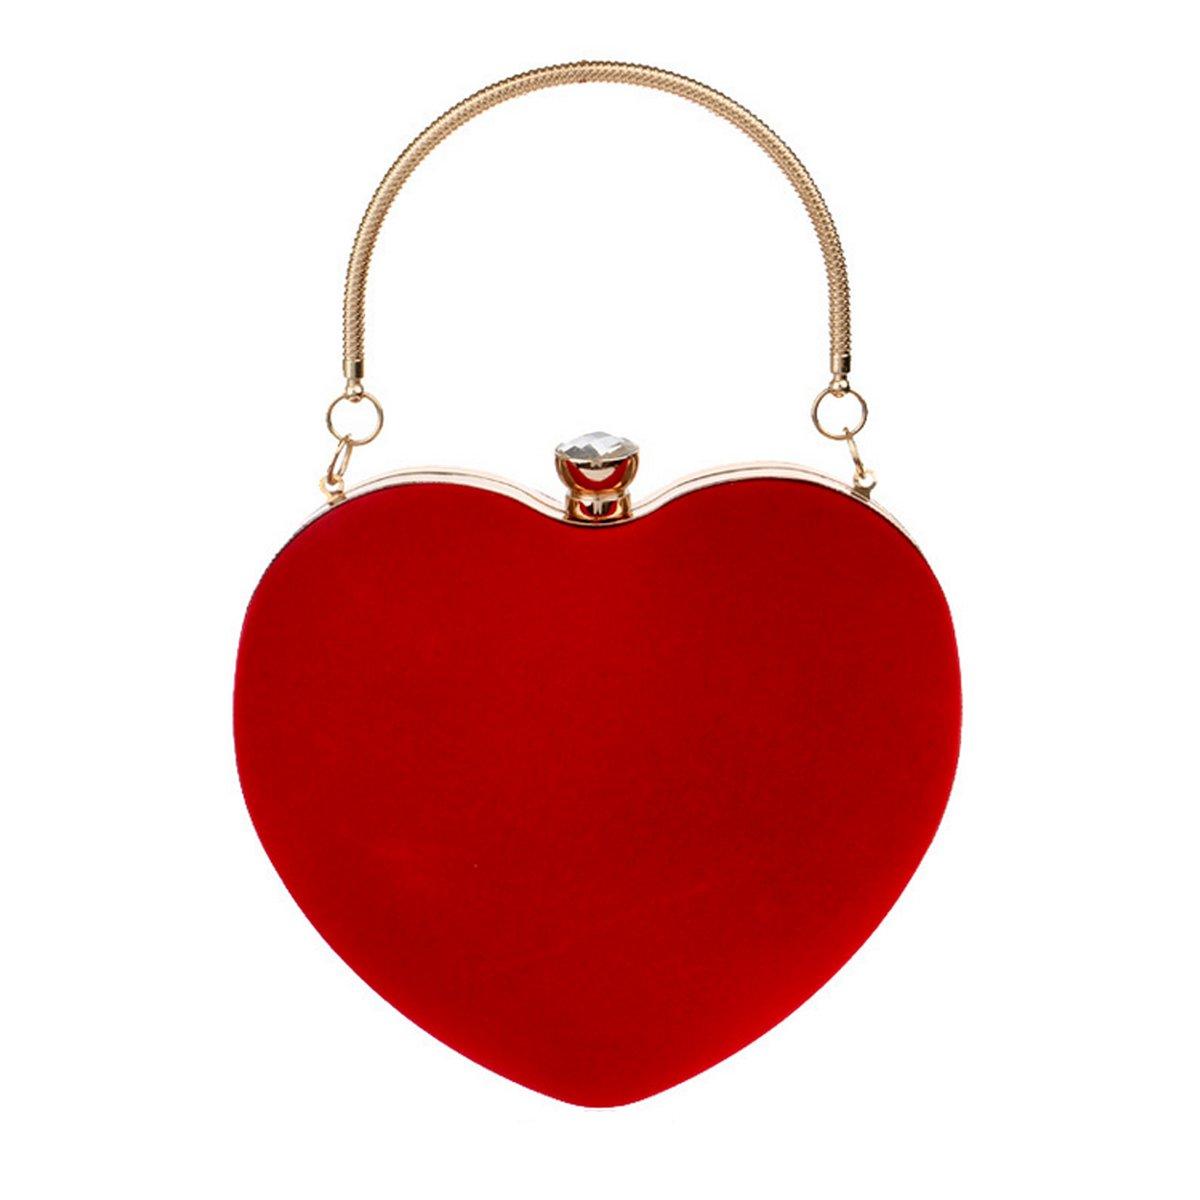 Kennedy Fashion Heart Shape Clutch Bag Velvet Tote Handbag Chain Shoulder Bag Evening Bag Purse(red)